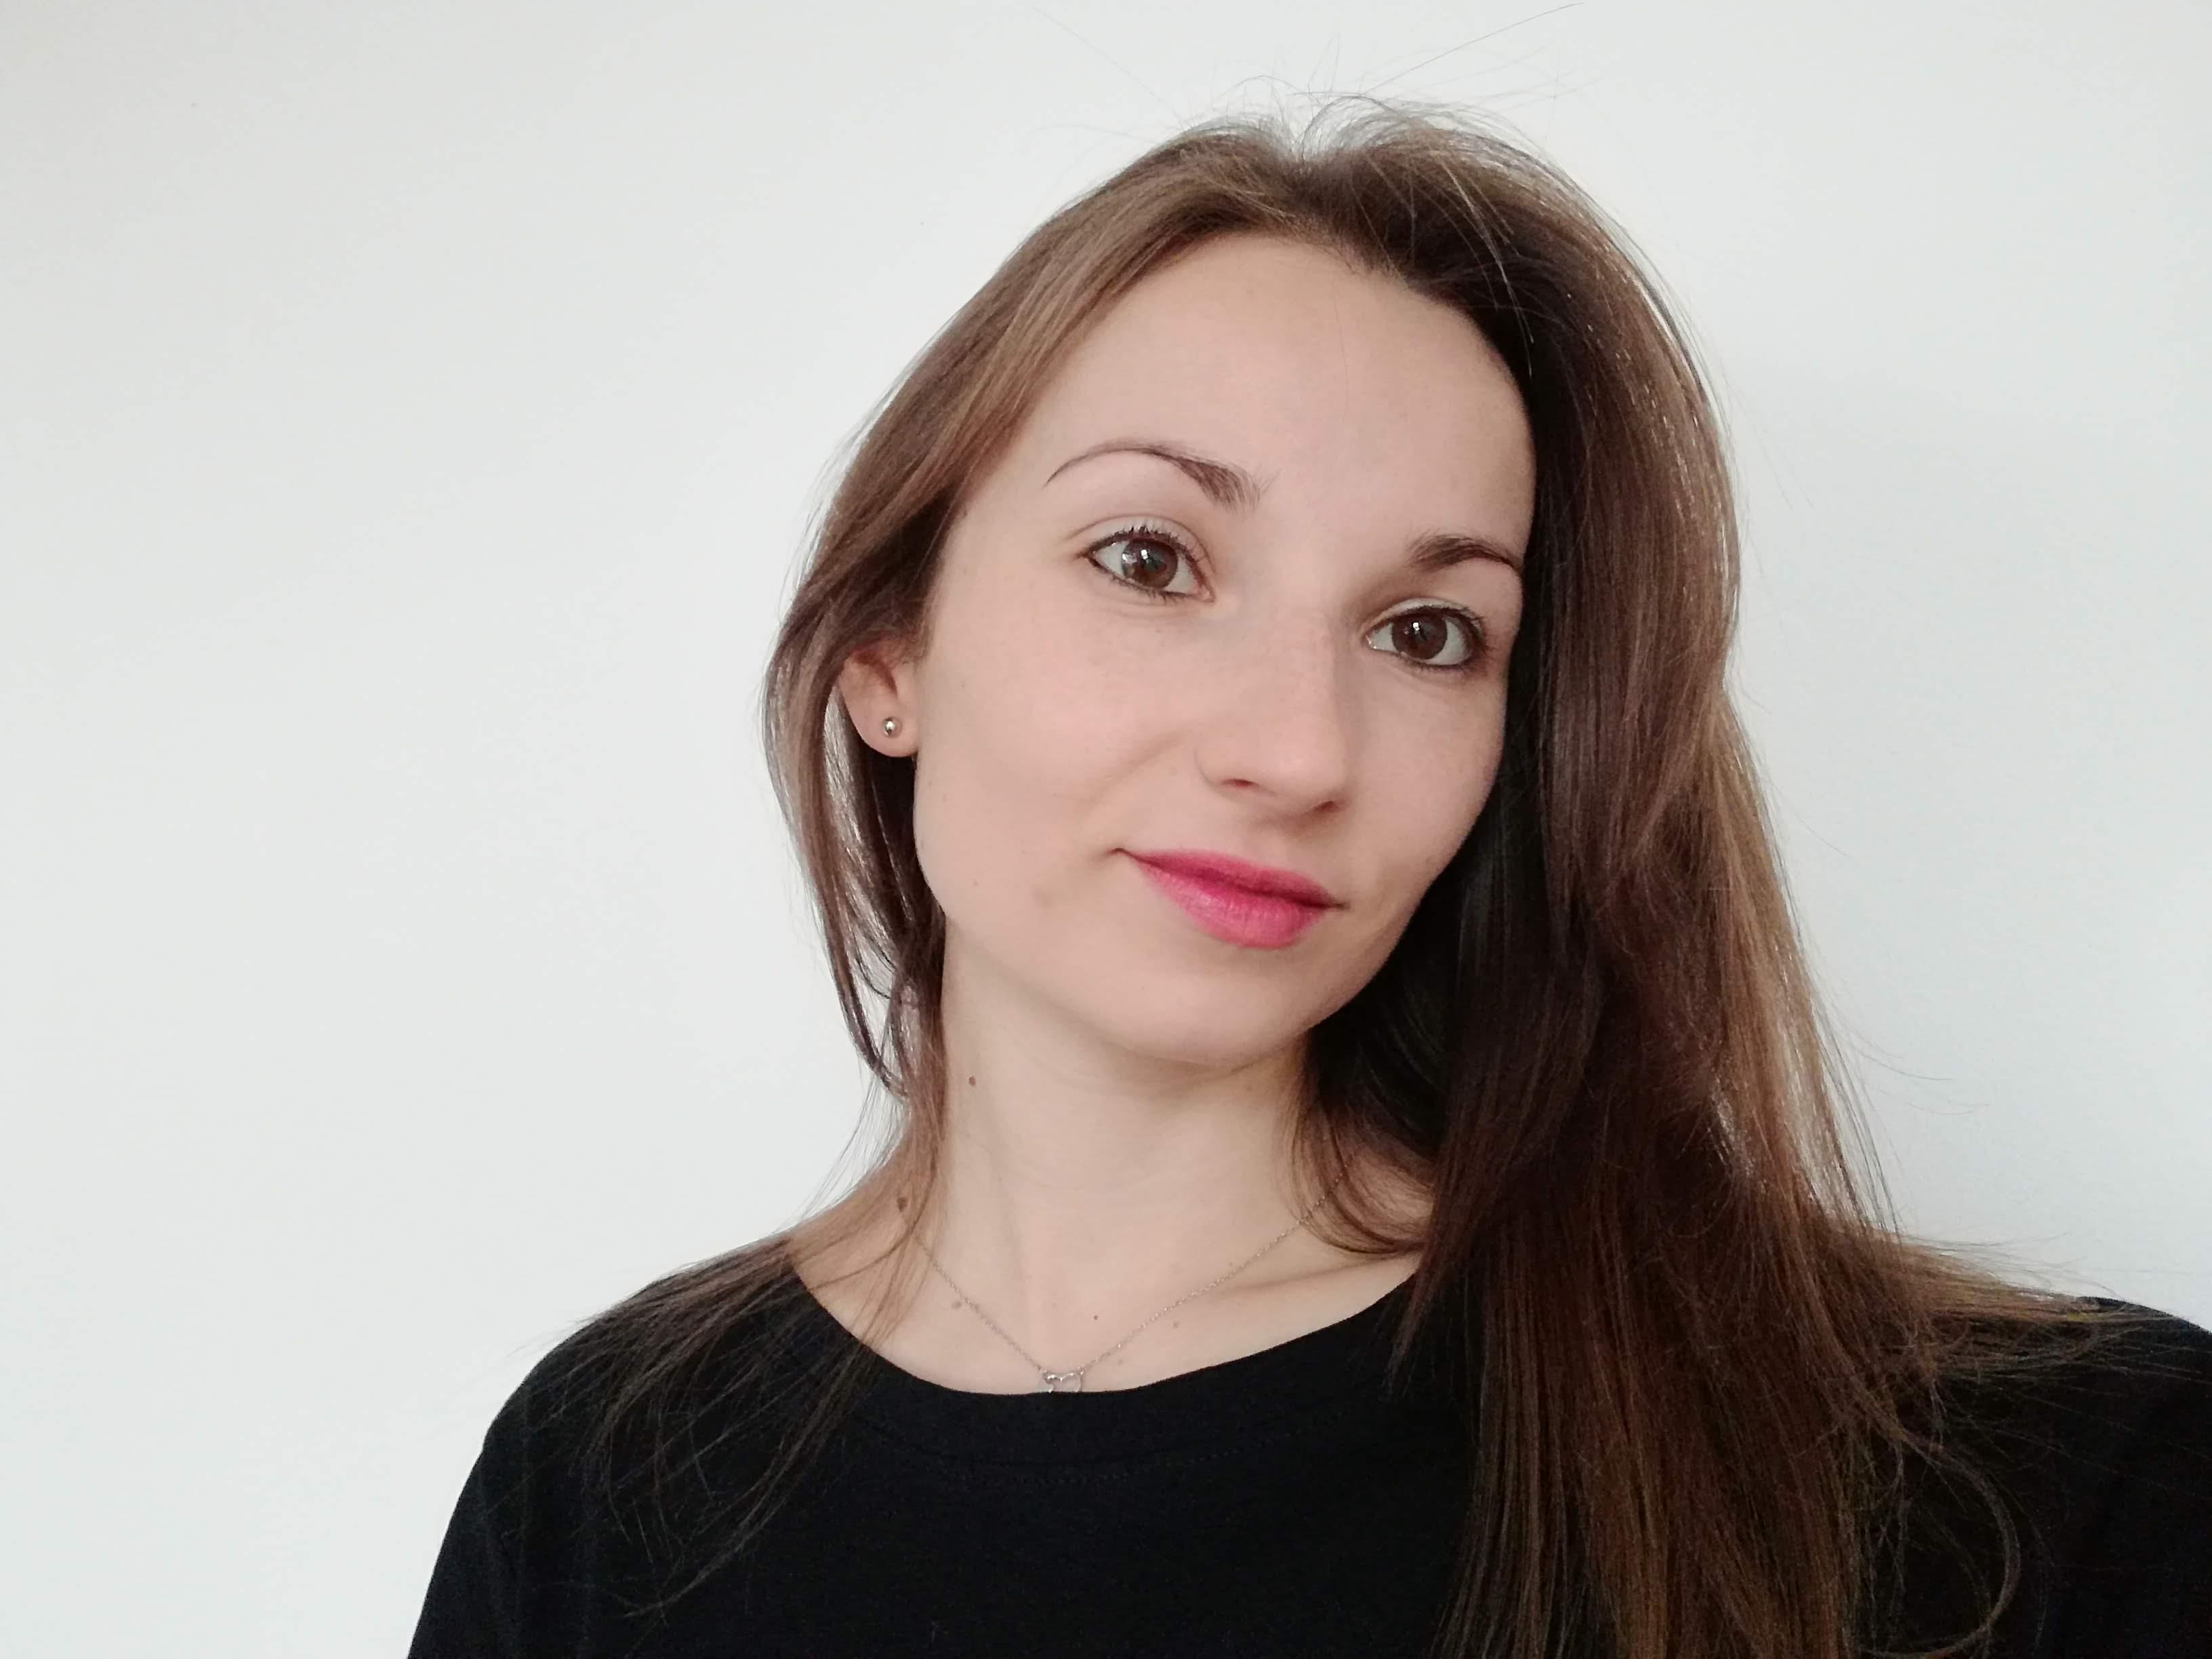 Aleksandra's picture